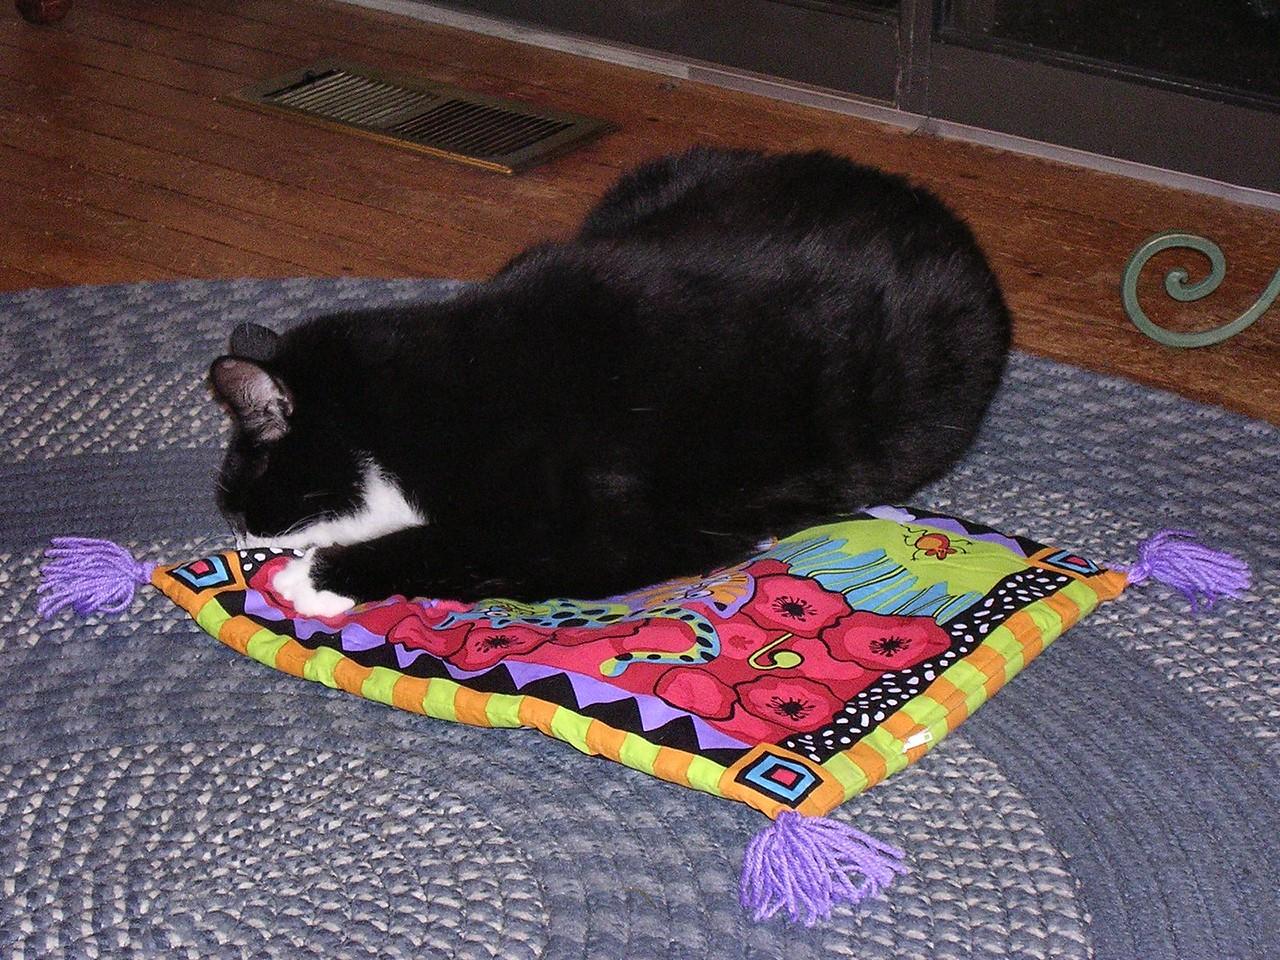 VAL: Ooooh, catnip! I LOVE catnip!